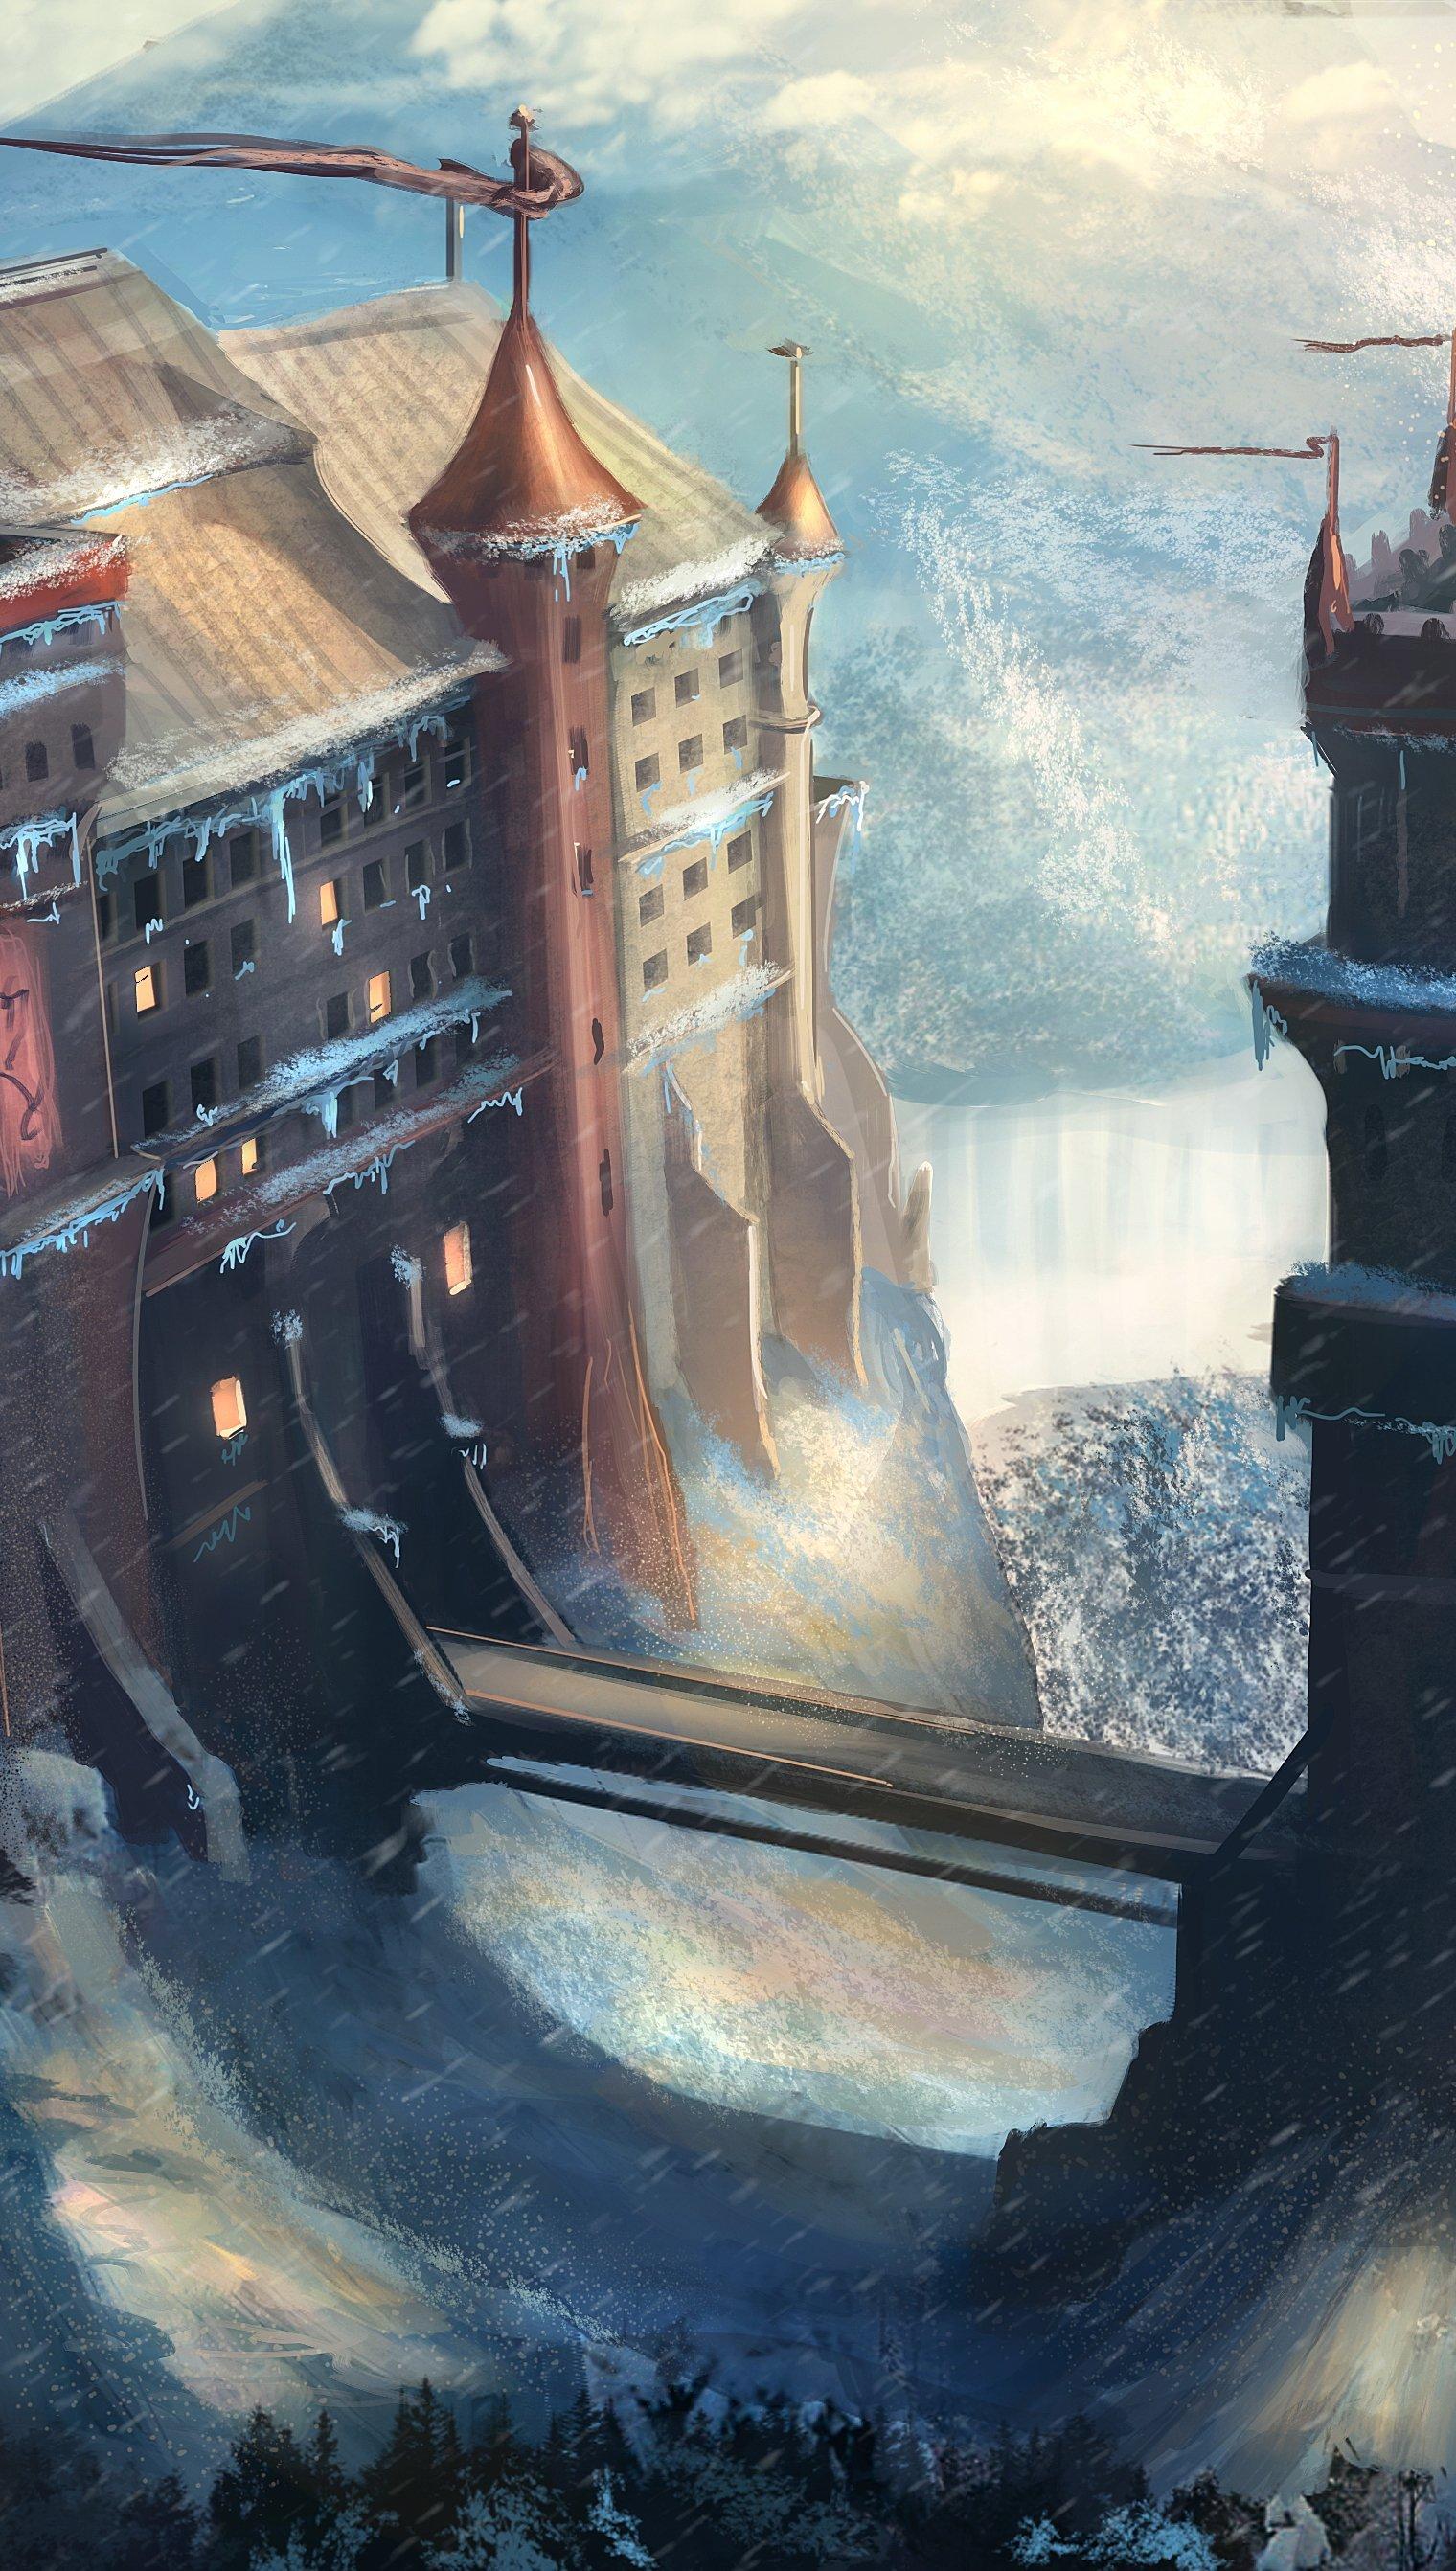 Wallpaper Game of Thrones Castle Vertical